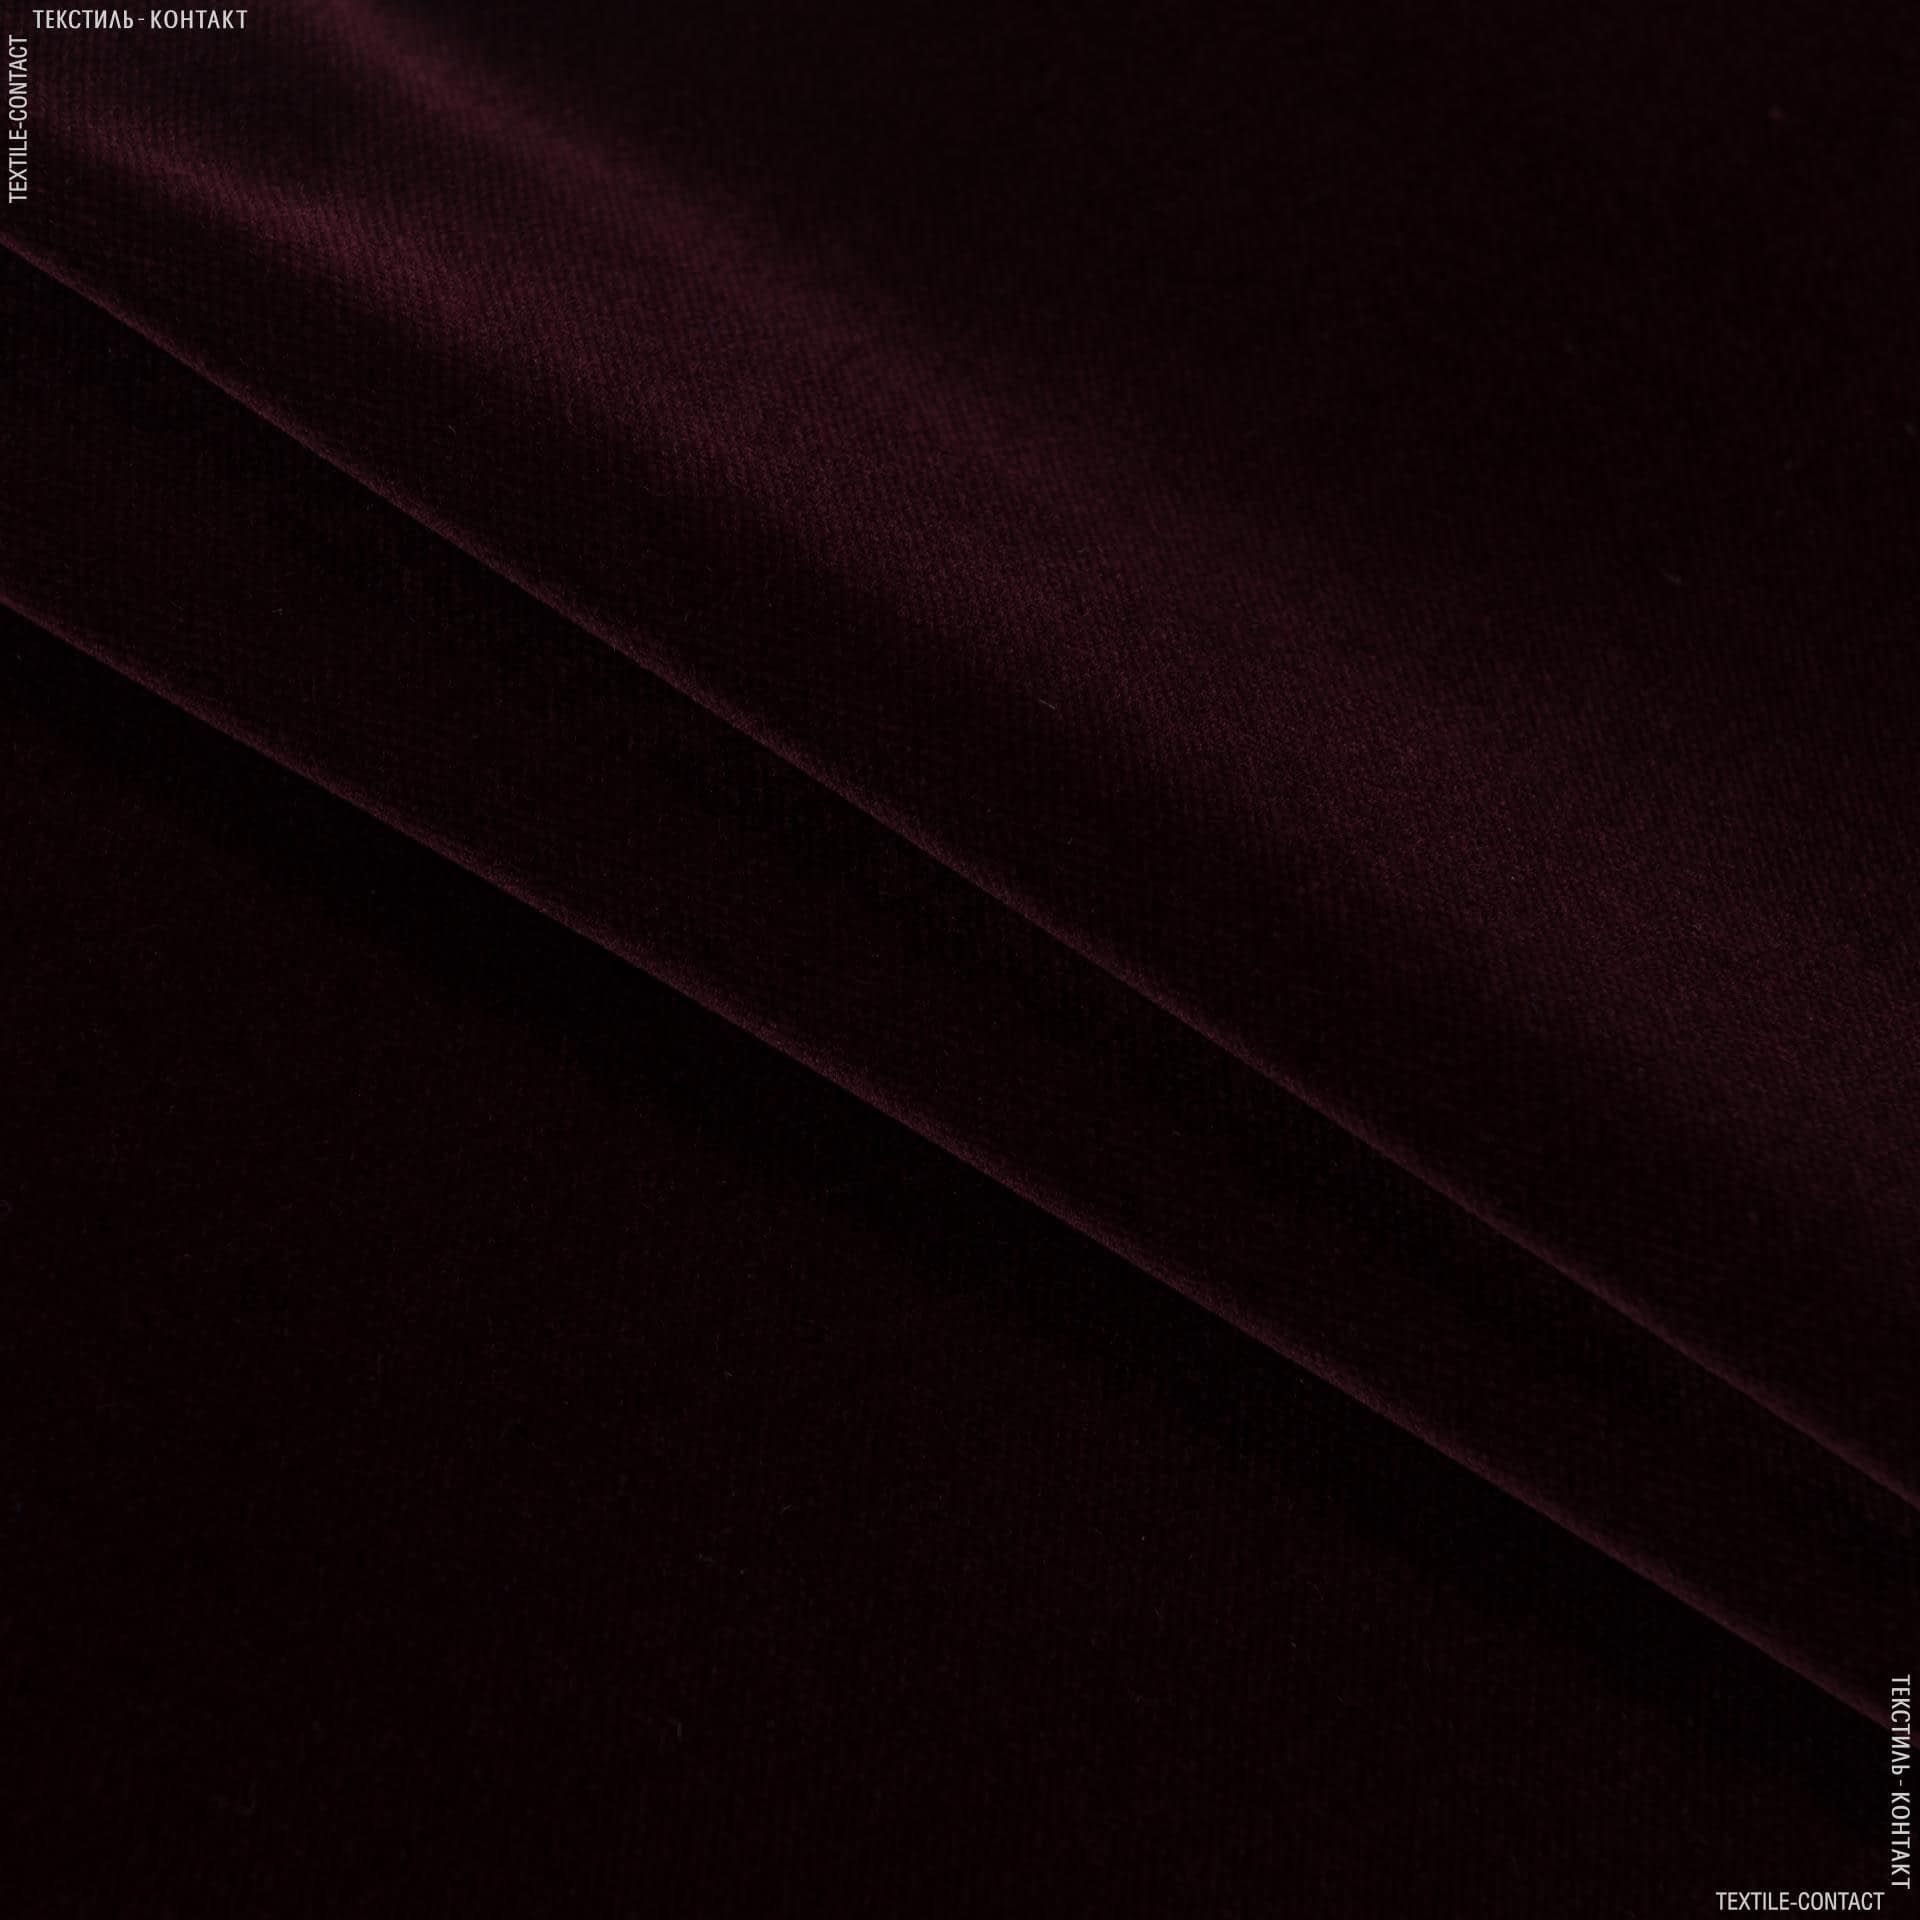 Ткани для мебели - Велюр  новара/novara бургунди сток